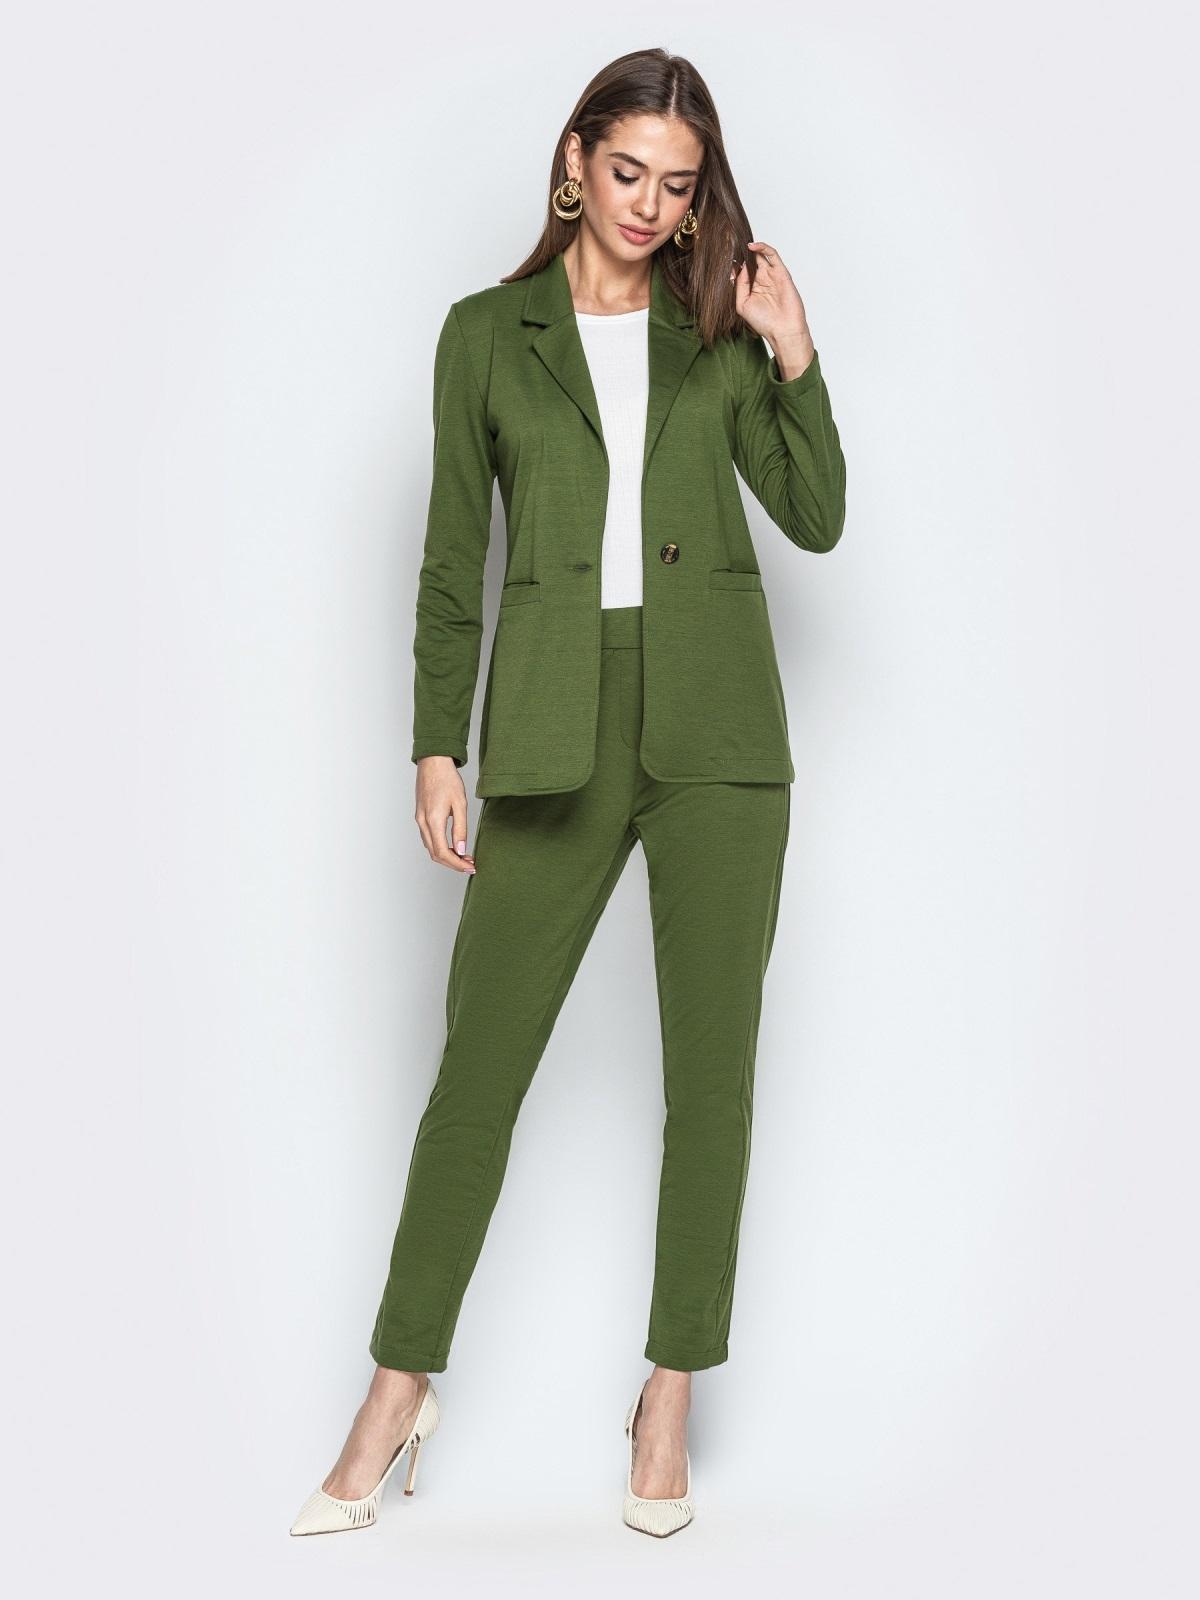 Комплект с брюками на резинке хаки - 20839, фото 1 – интернет-магазин Dressa